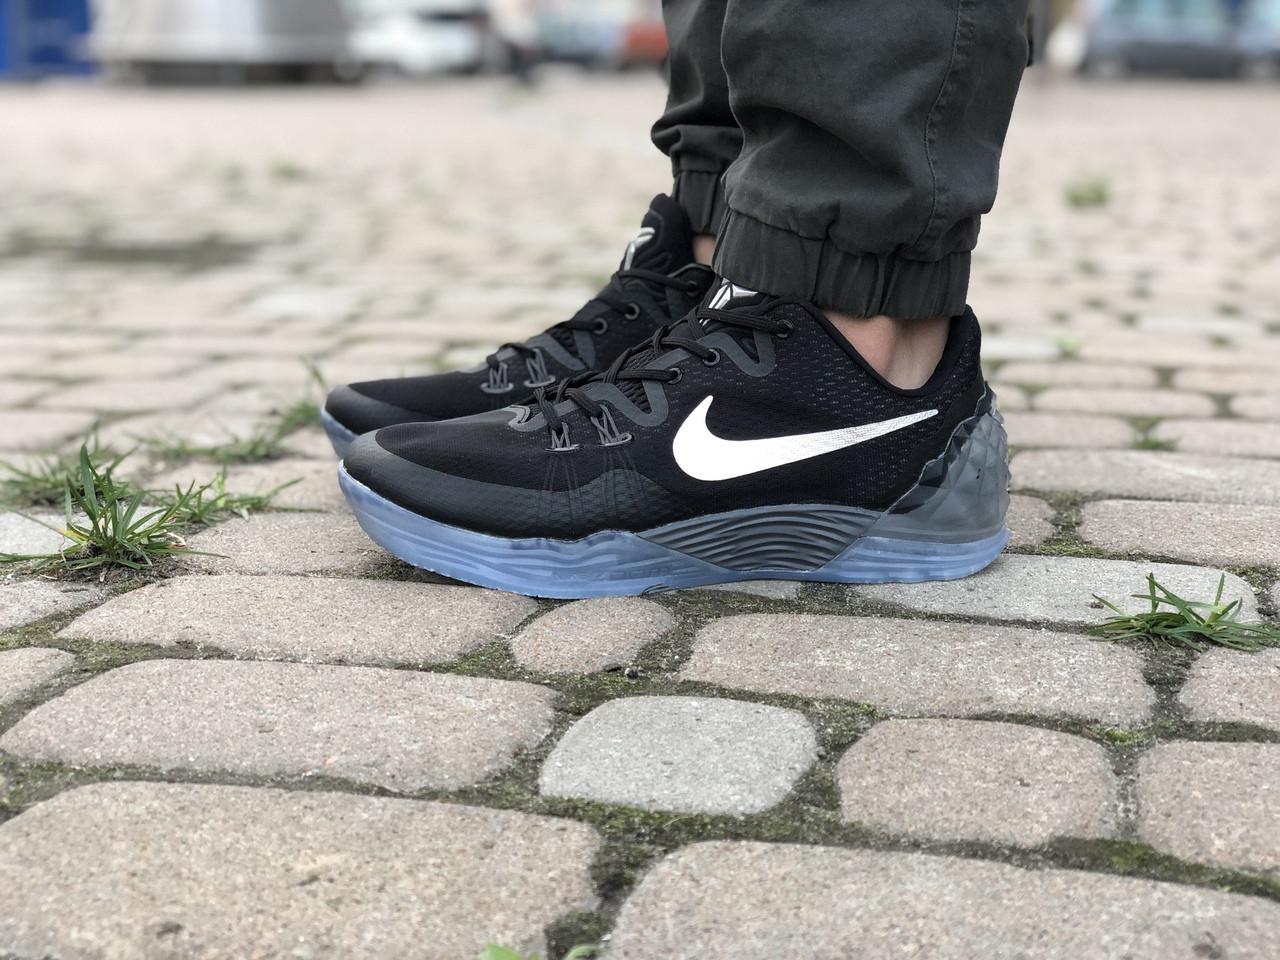 Кроссовки мужские Nike Zoom Kobe Venomenon 5. ТОП качество!!! Реплика